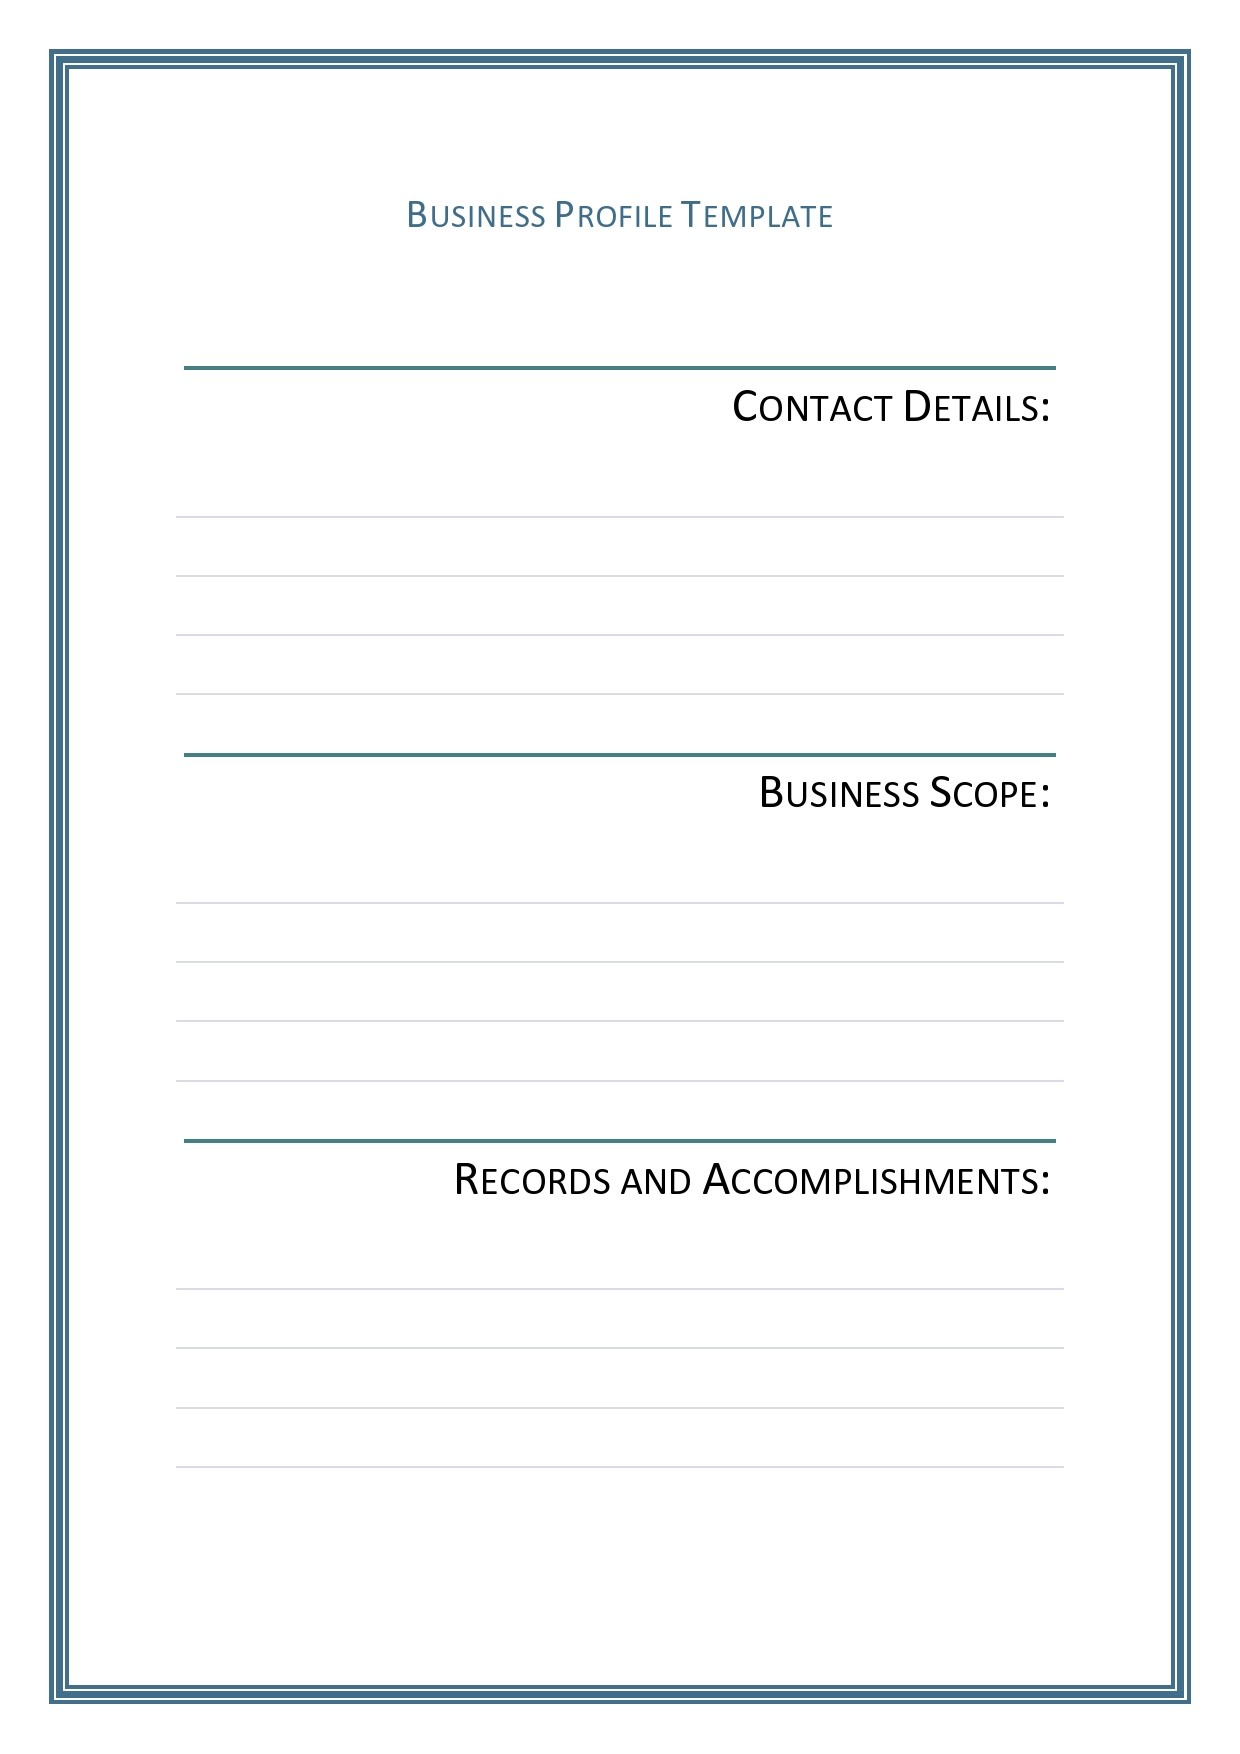 Free company profile template 12